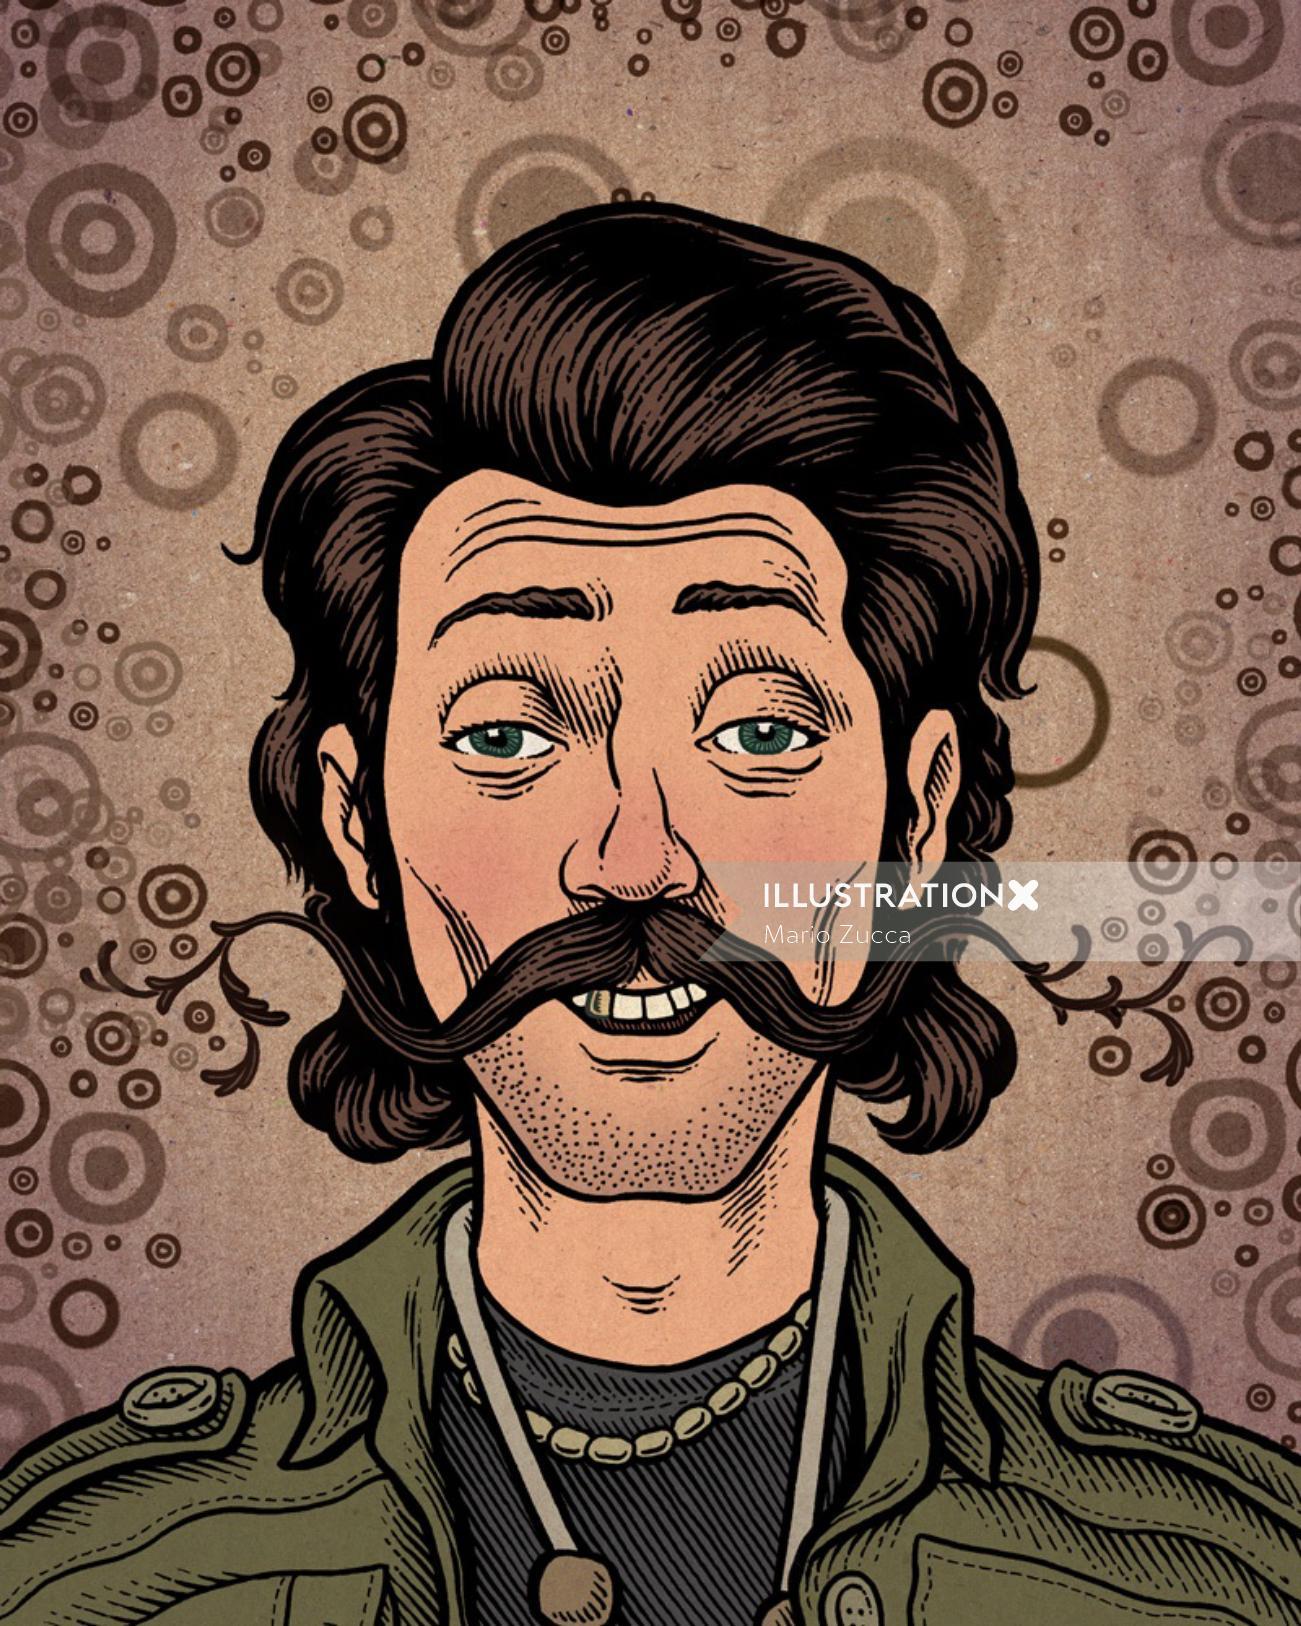 Eugene hutz portrait by American illustrator